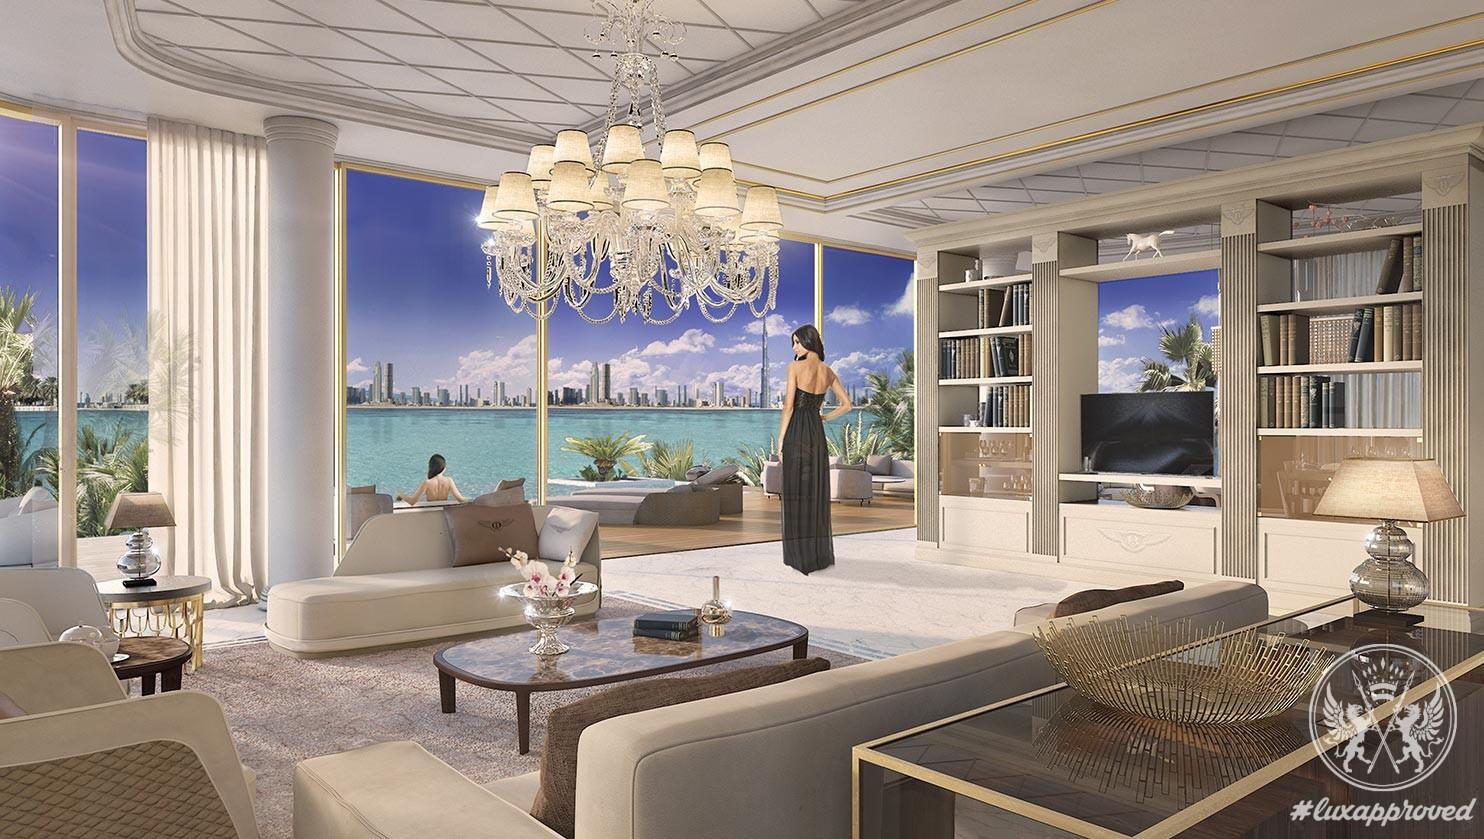 Dubai World Islands Will Welcome Luxury Bentley Villas